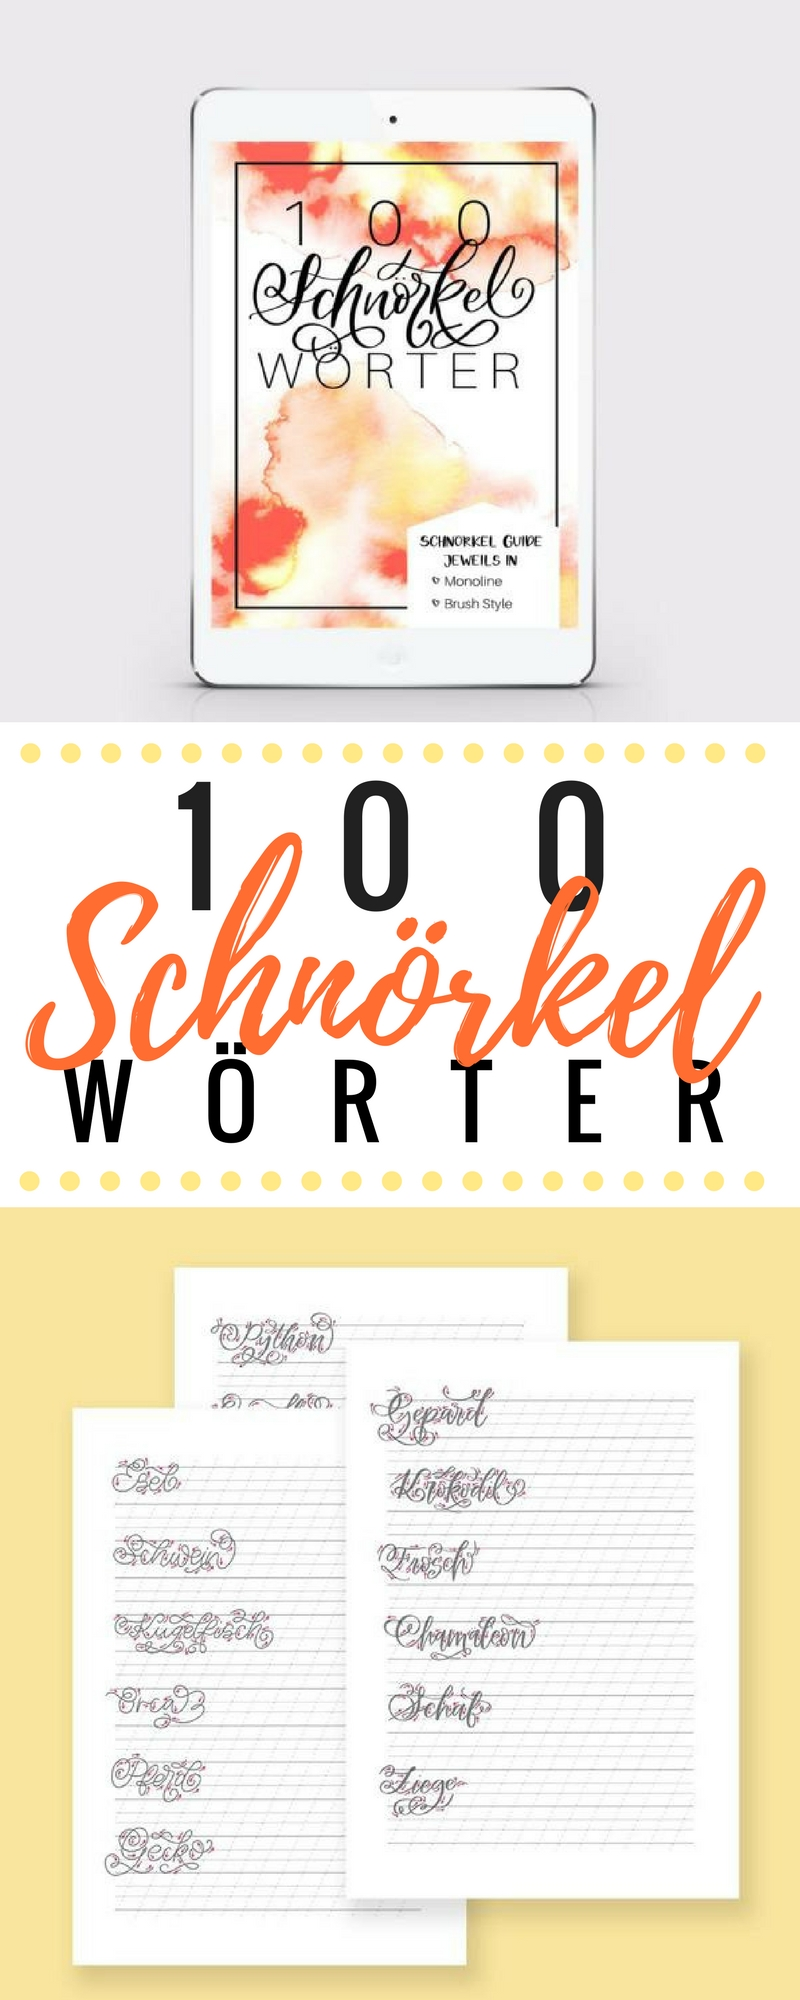 100 Schnörkel Wörter